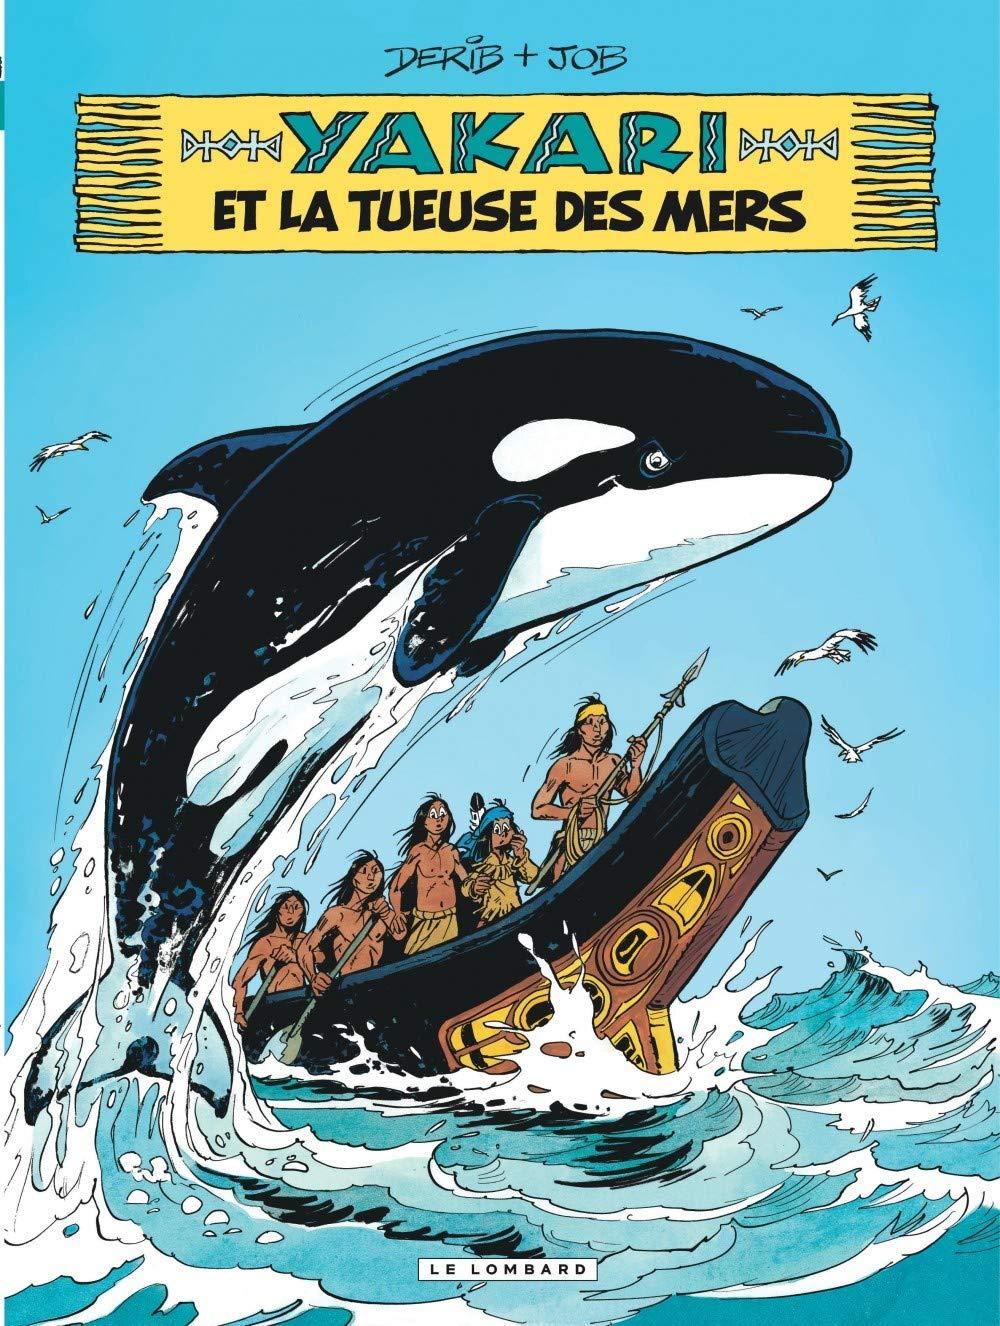 Yakari Tome 38 La Tueuse Des Mers Yakari 38 French Edition Job Derib 9782803632886 Amazon Com Books